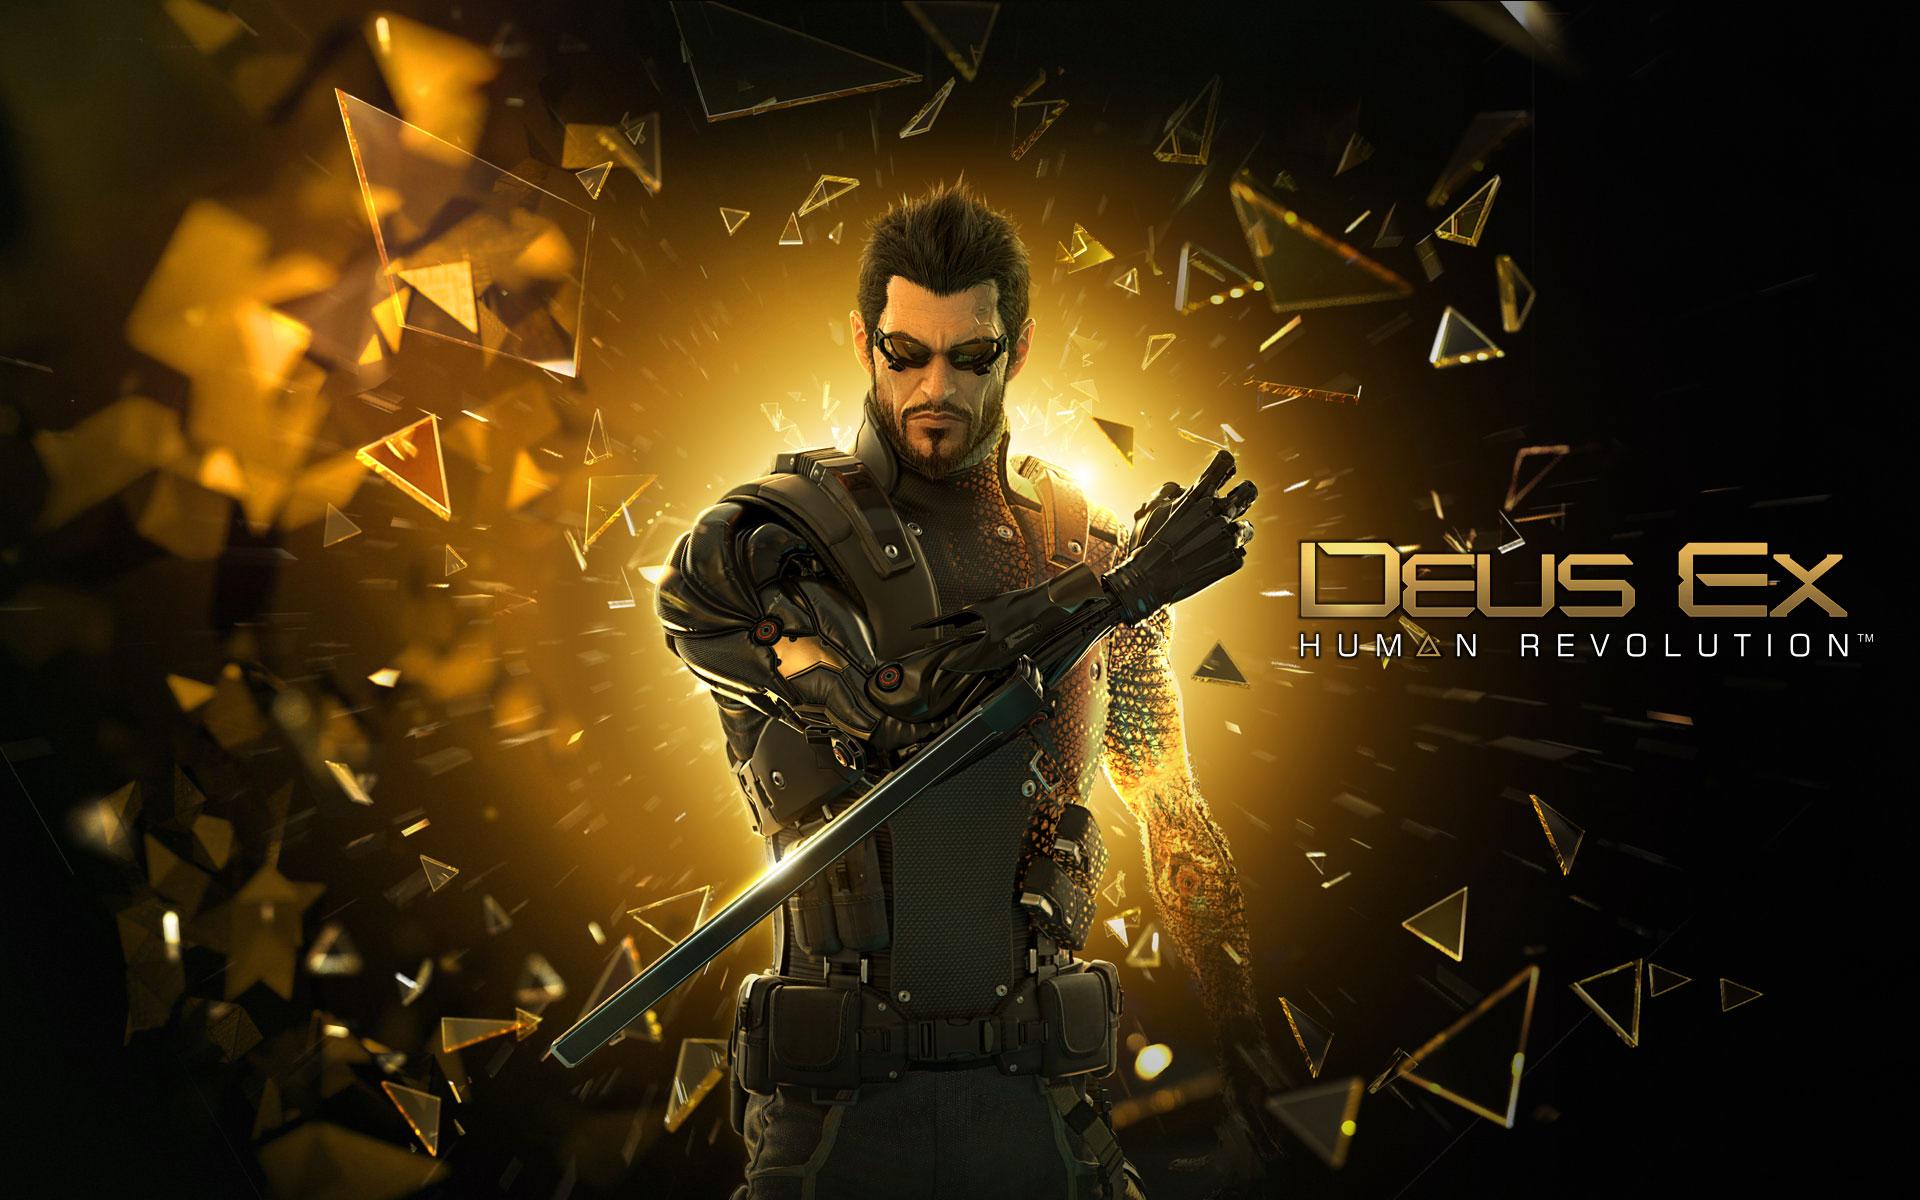 Deus Ex Human Revolution   Wallpaper by Christian2506 on 1920x1200